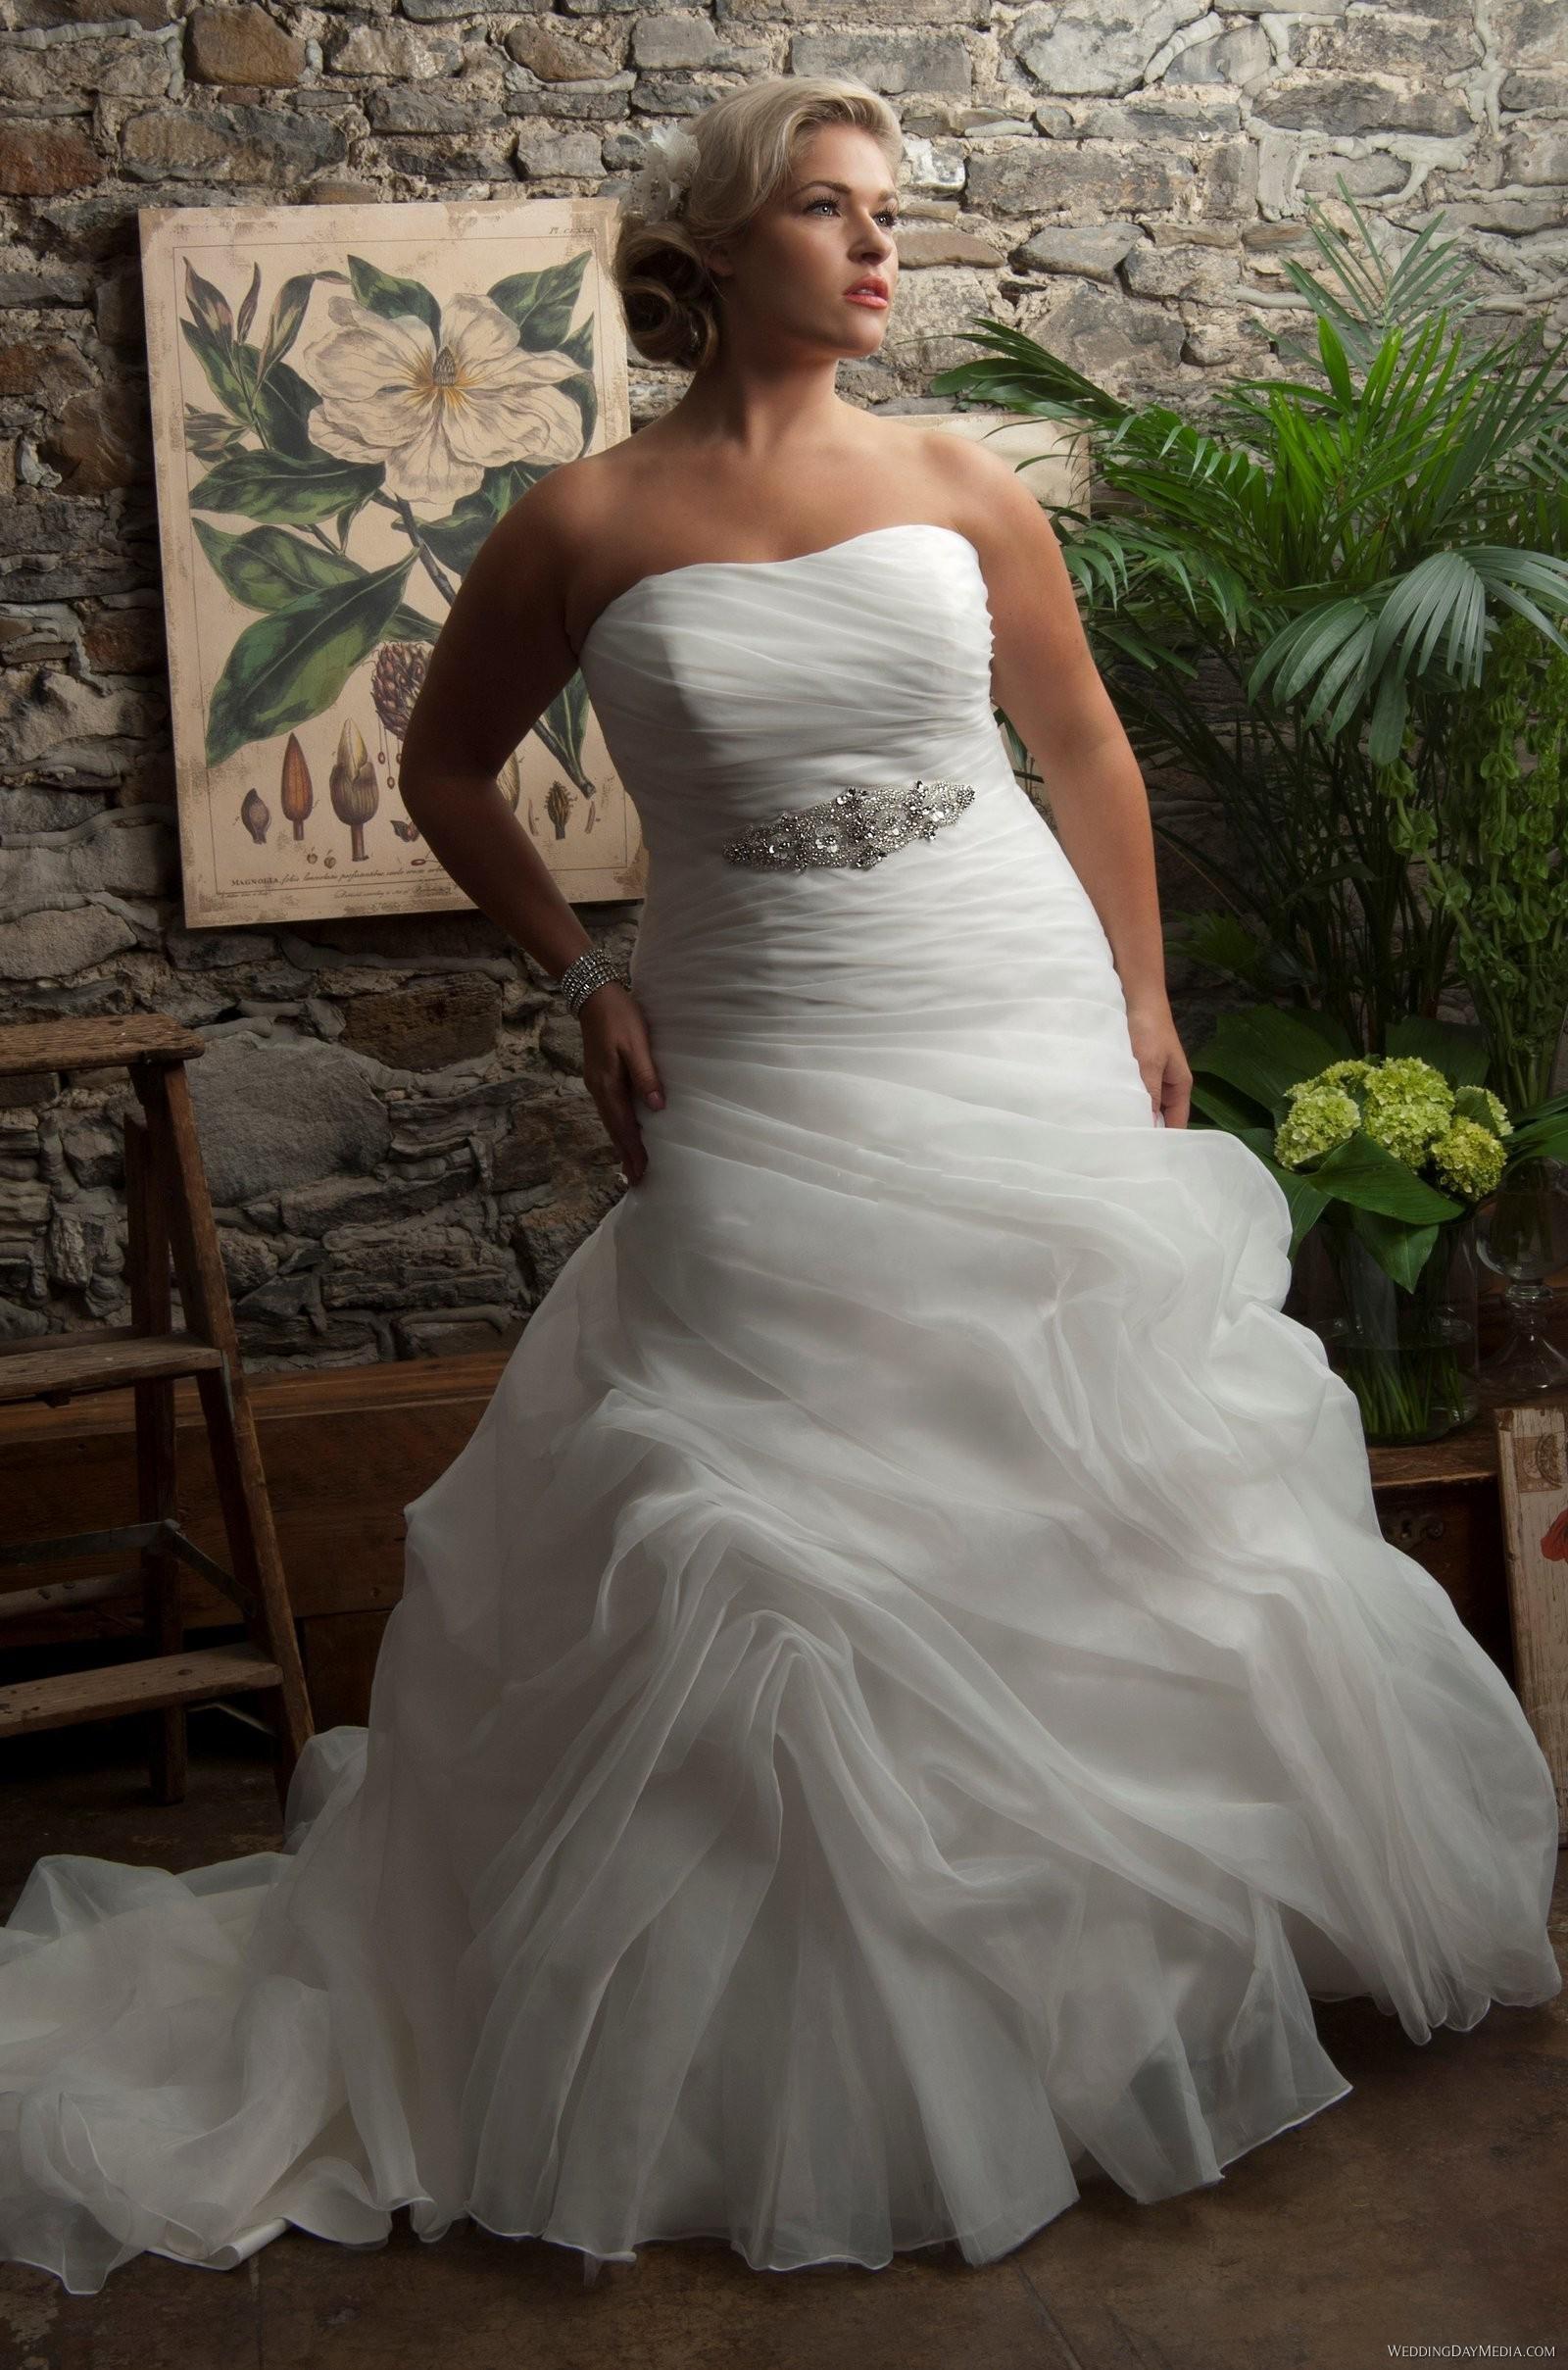 Discount Cheap Elegant Strapless Pleated Bodice Organza Ruffle Beaded Belt Lace Up Plus Size Train Wedding Dress Bridal Gown Ri355 Designer Dresses: Pleated Bodice Strapless Wedding Dress At Reisefeber.org